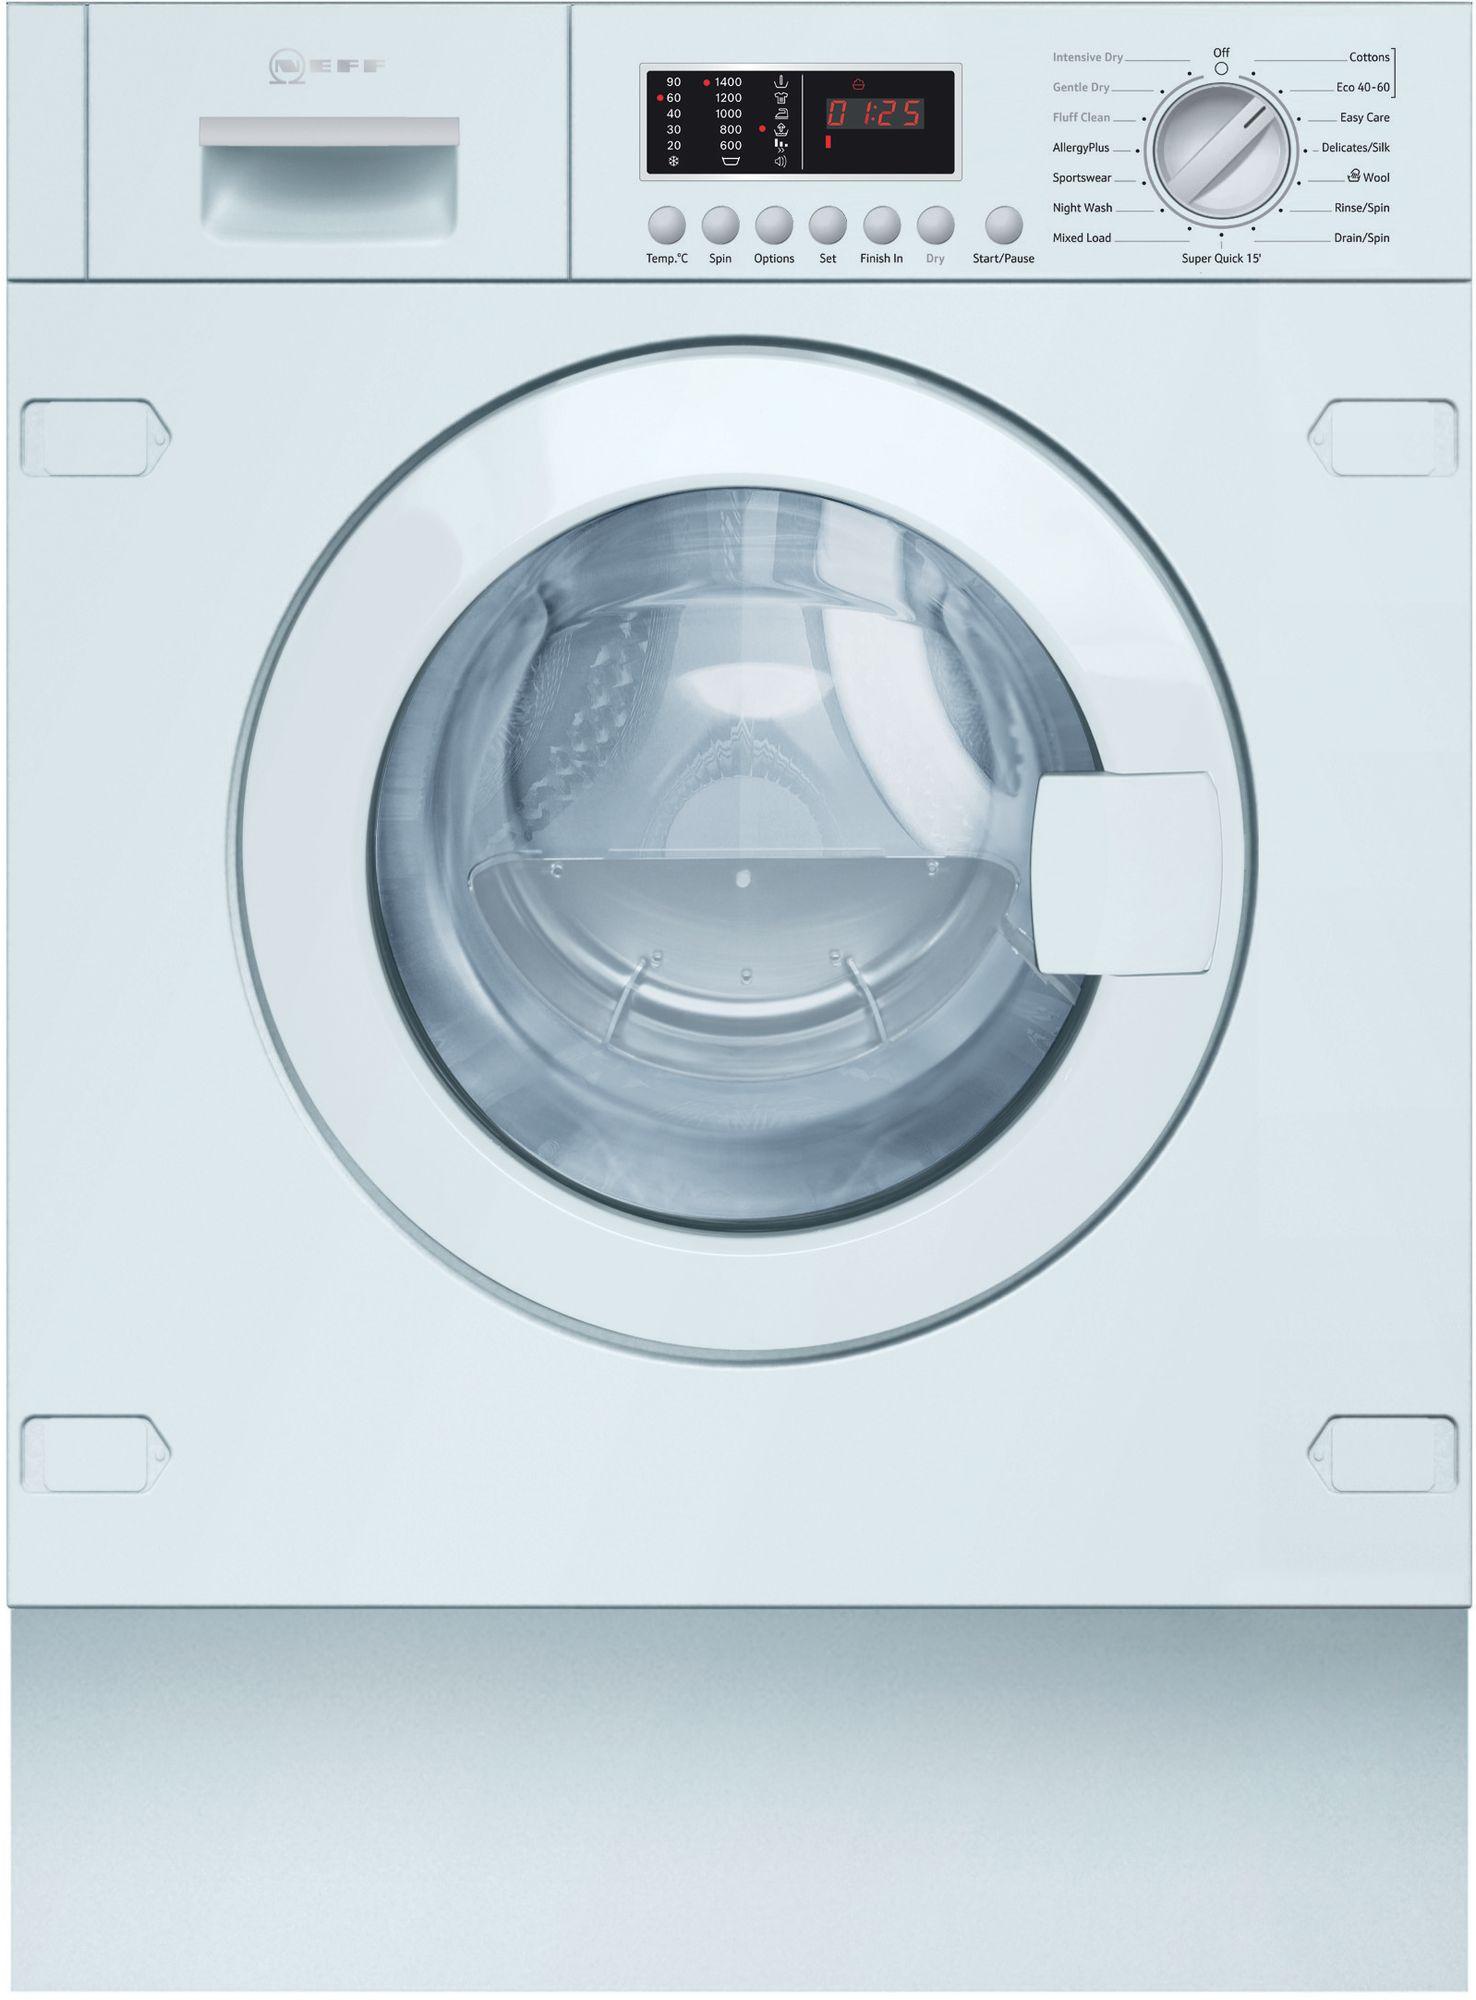 Neff Built-In Washer Dryer 7/4KG V6540X2GB